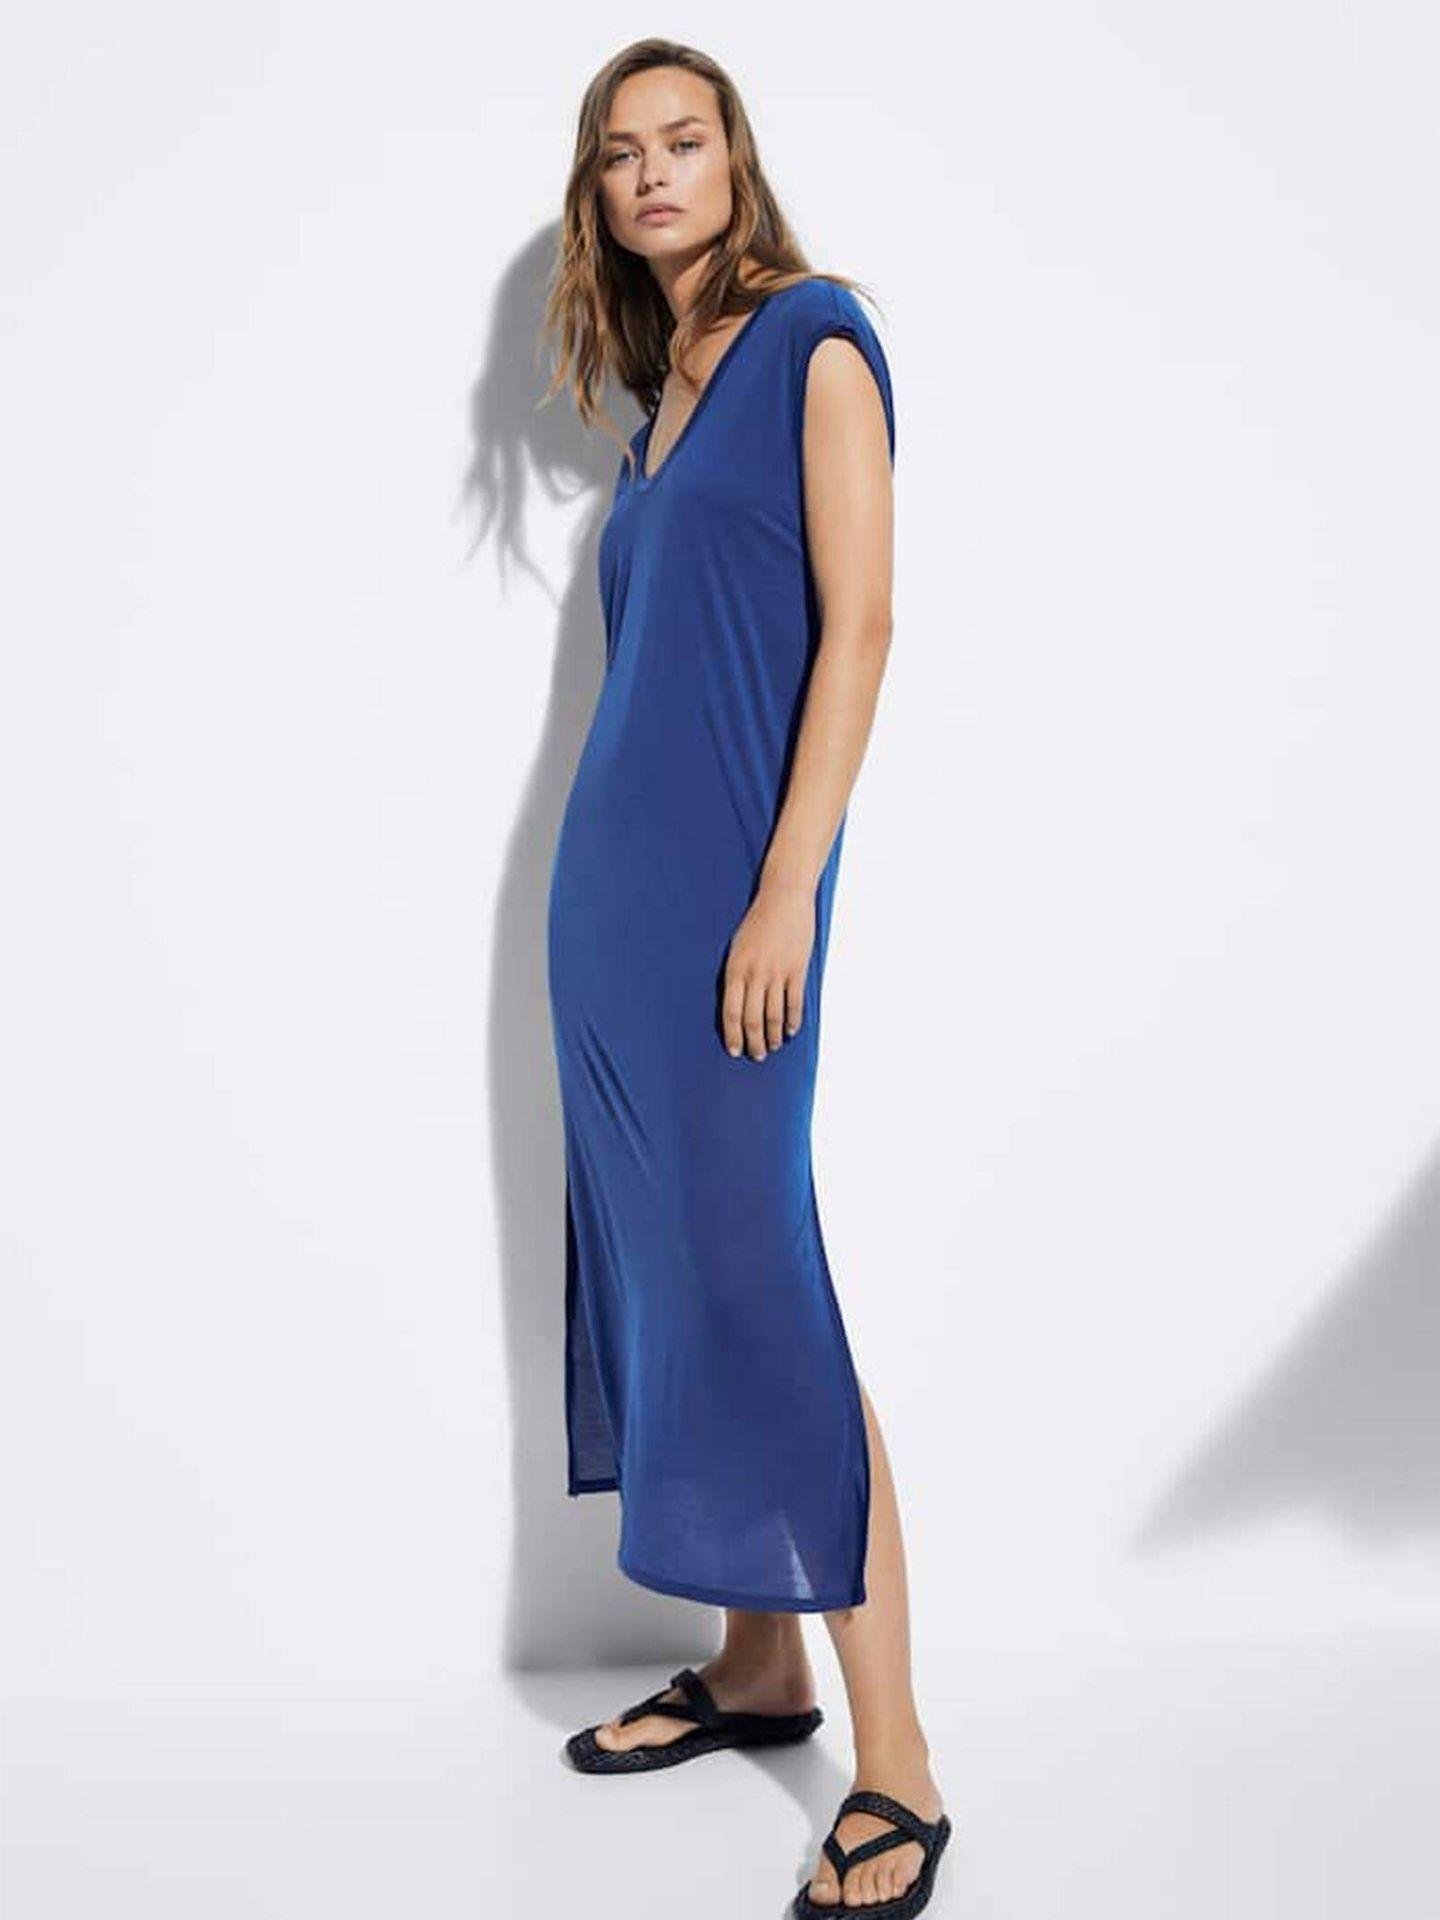 Vestido azul low cost de Massimo Dutti. (Cortesía)